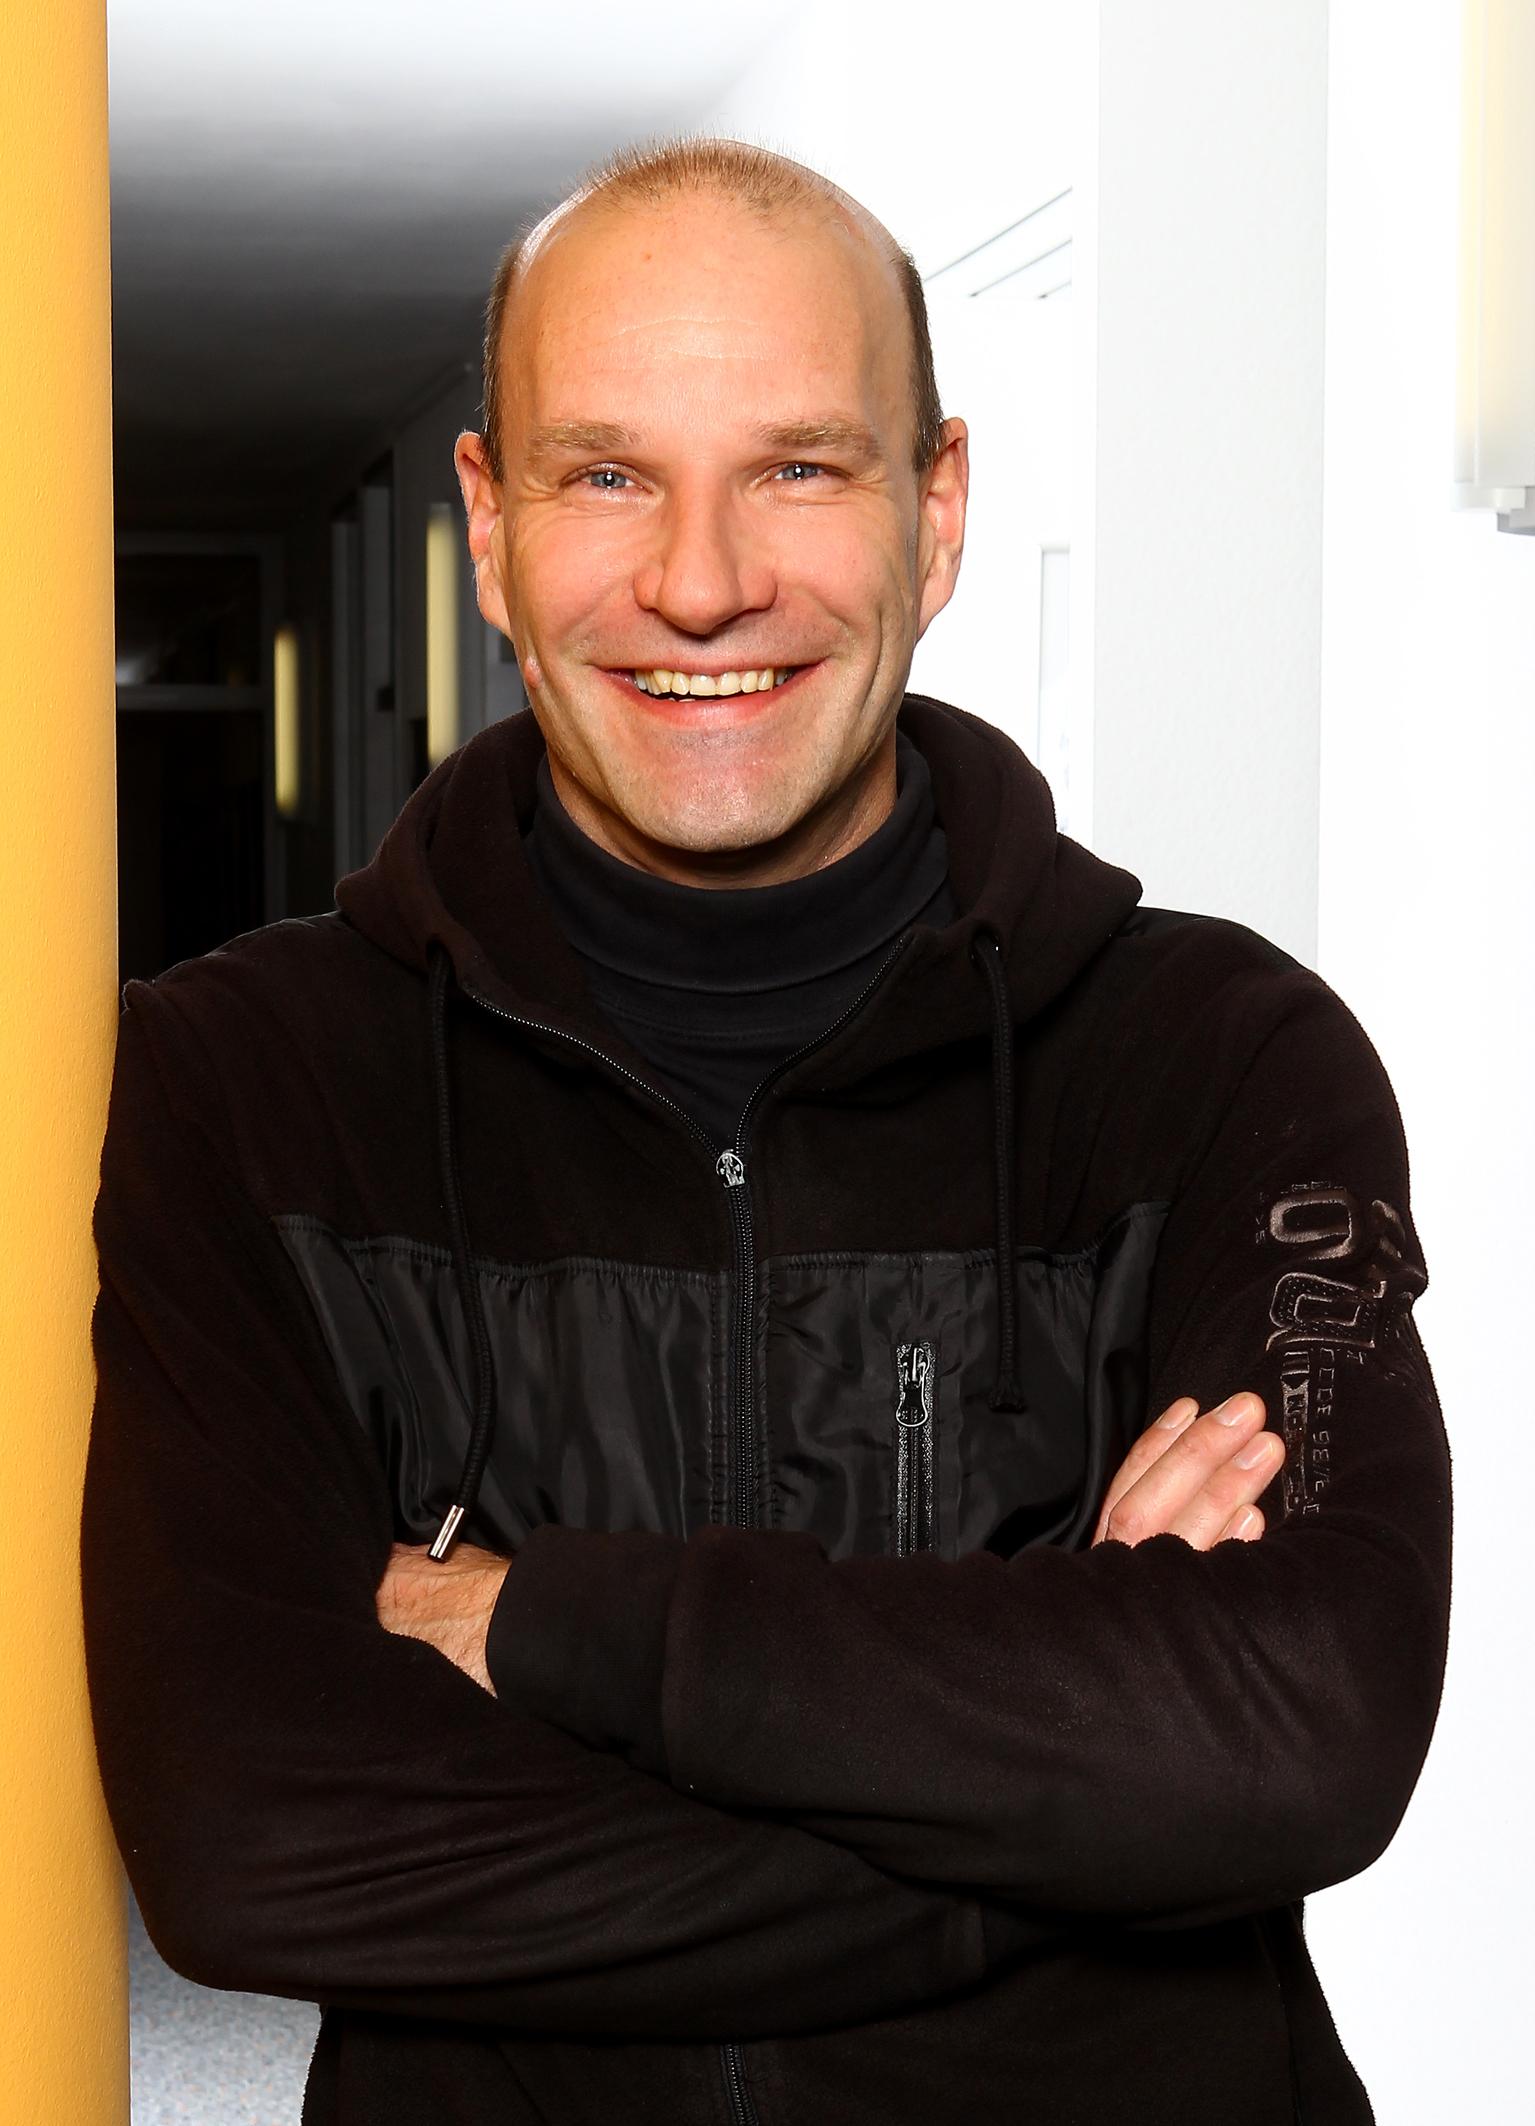 Ulrich Preißler